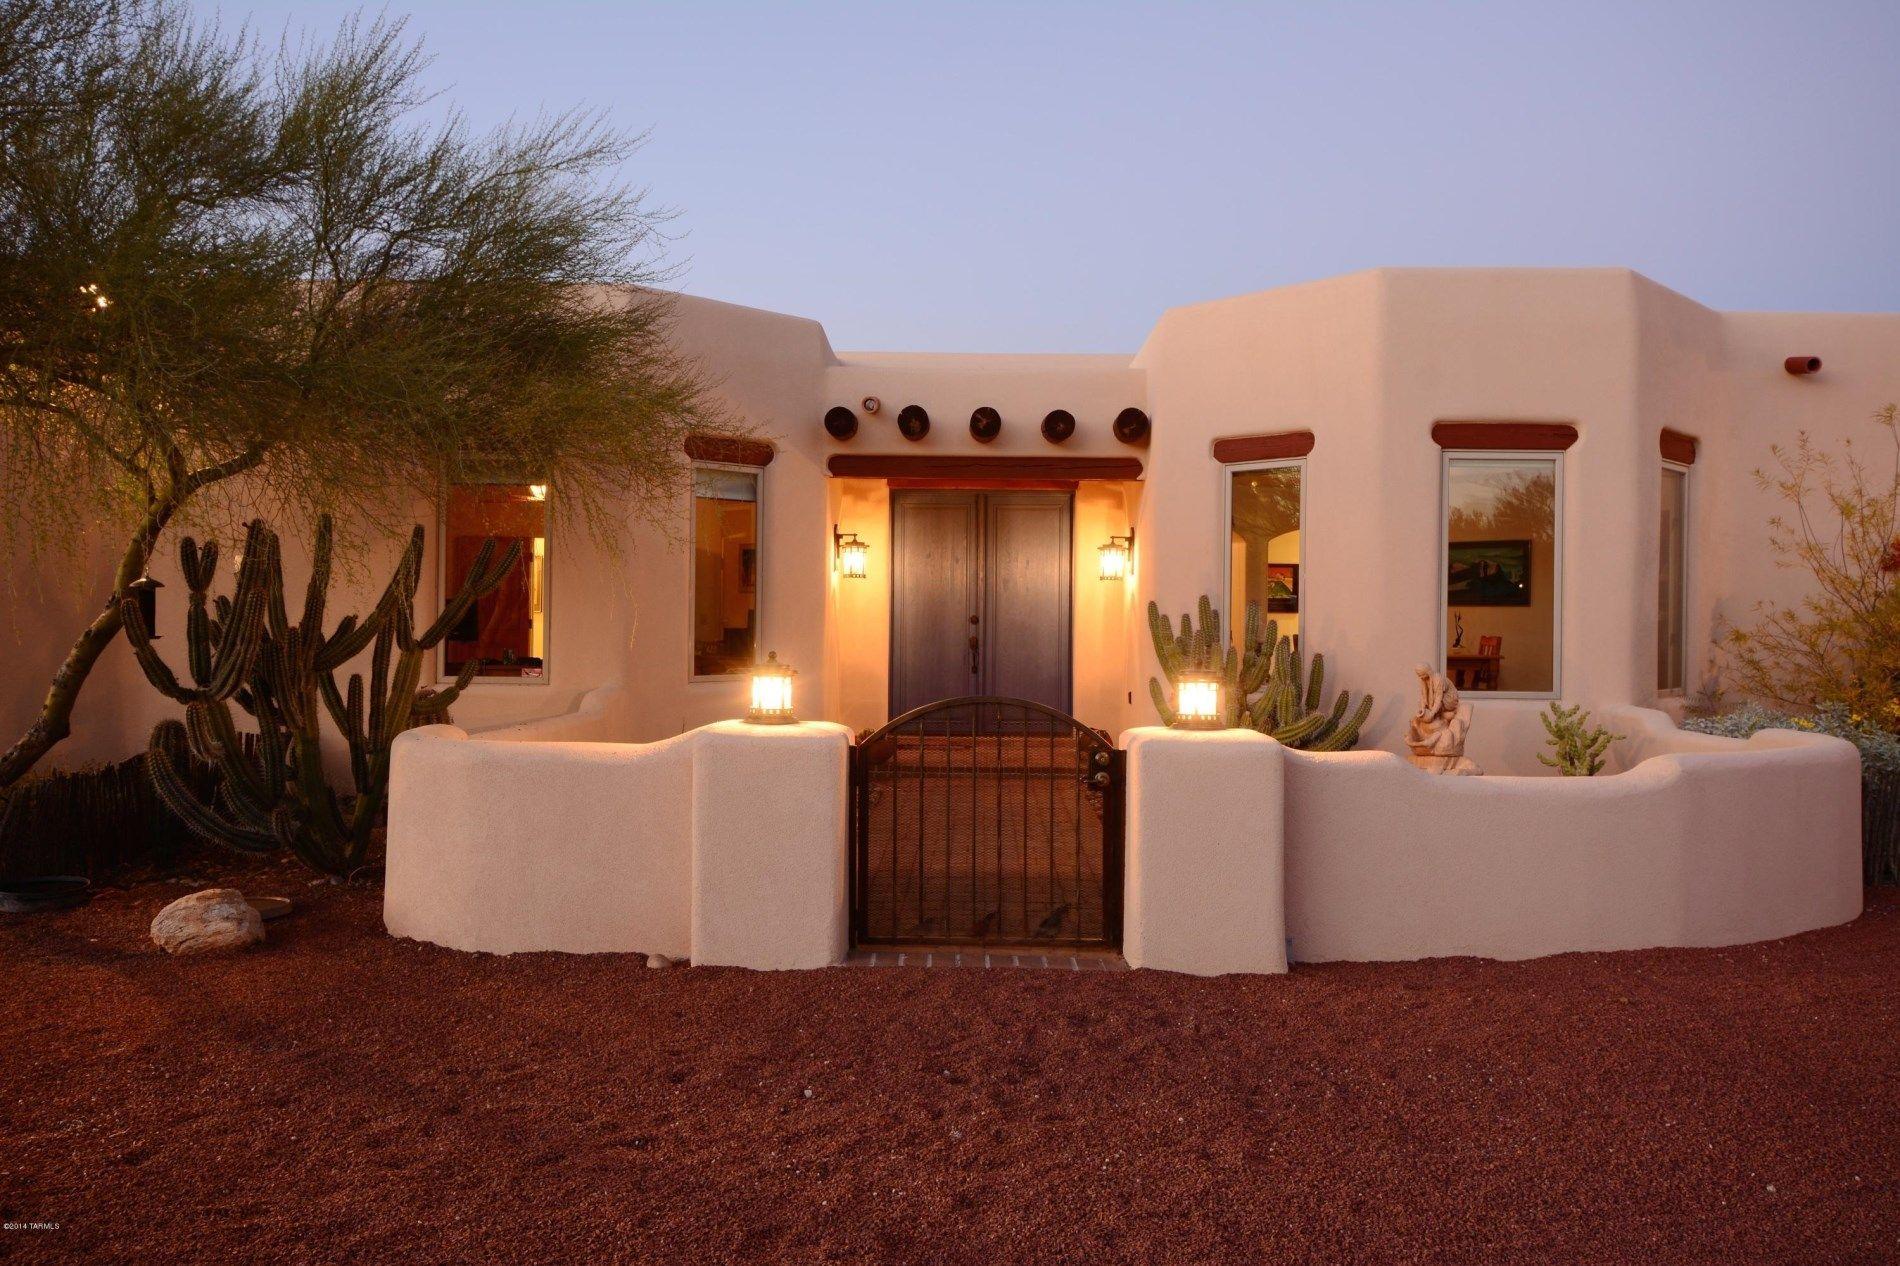 santa fe style homes for sale in tucson az